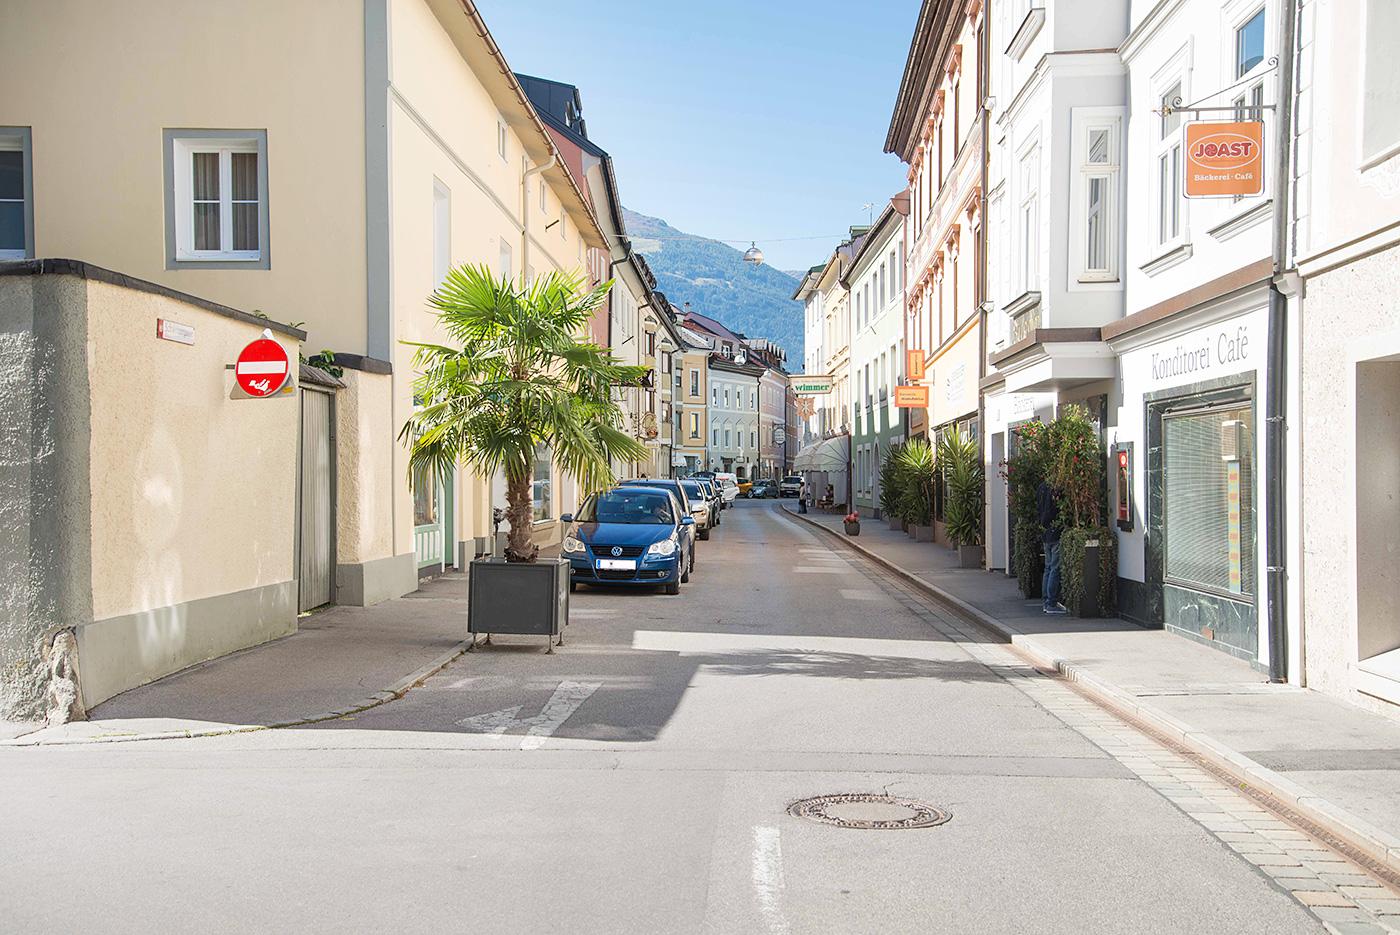 13fa2b44c9b911 Schweizergasse  Künftig kurvig statt gerade